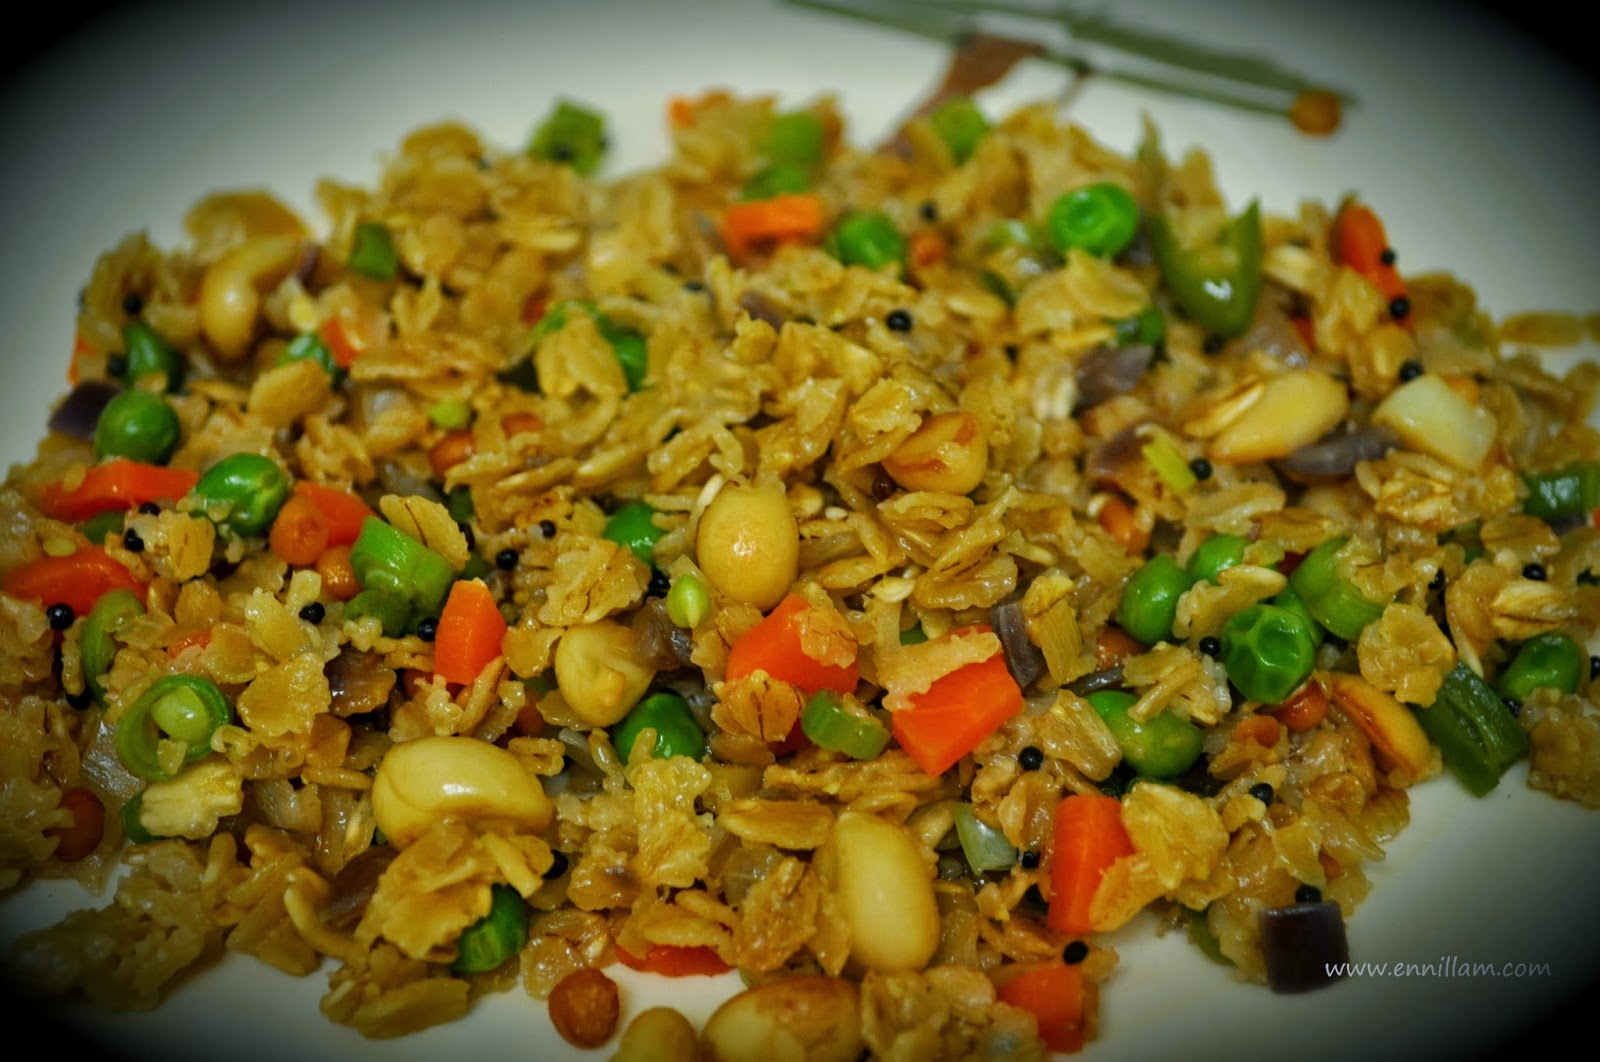 Healthy oats upma